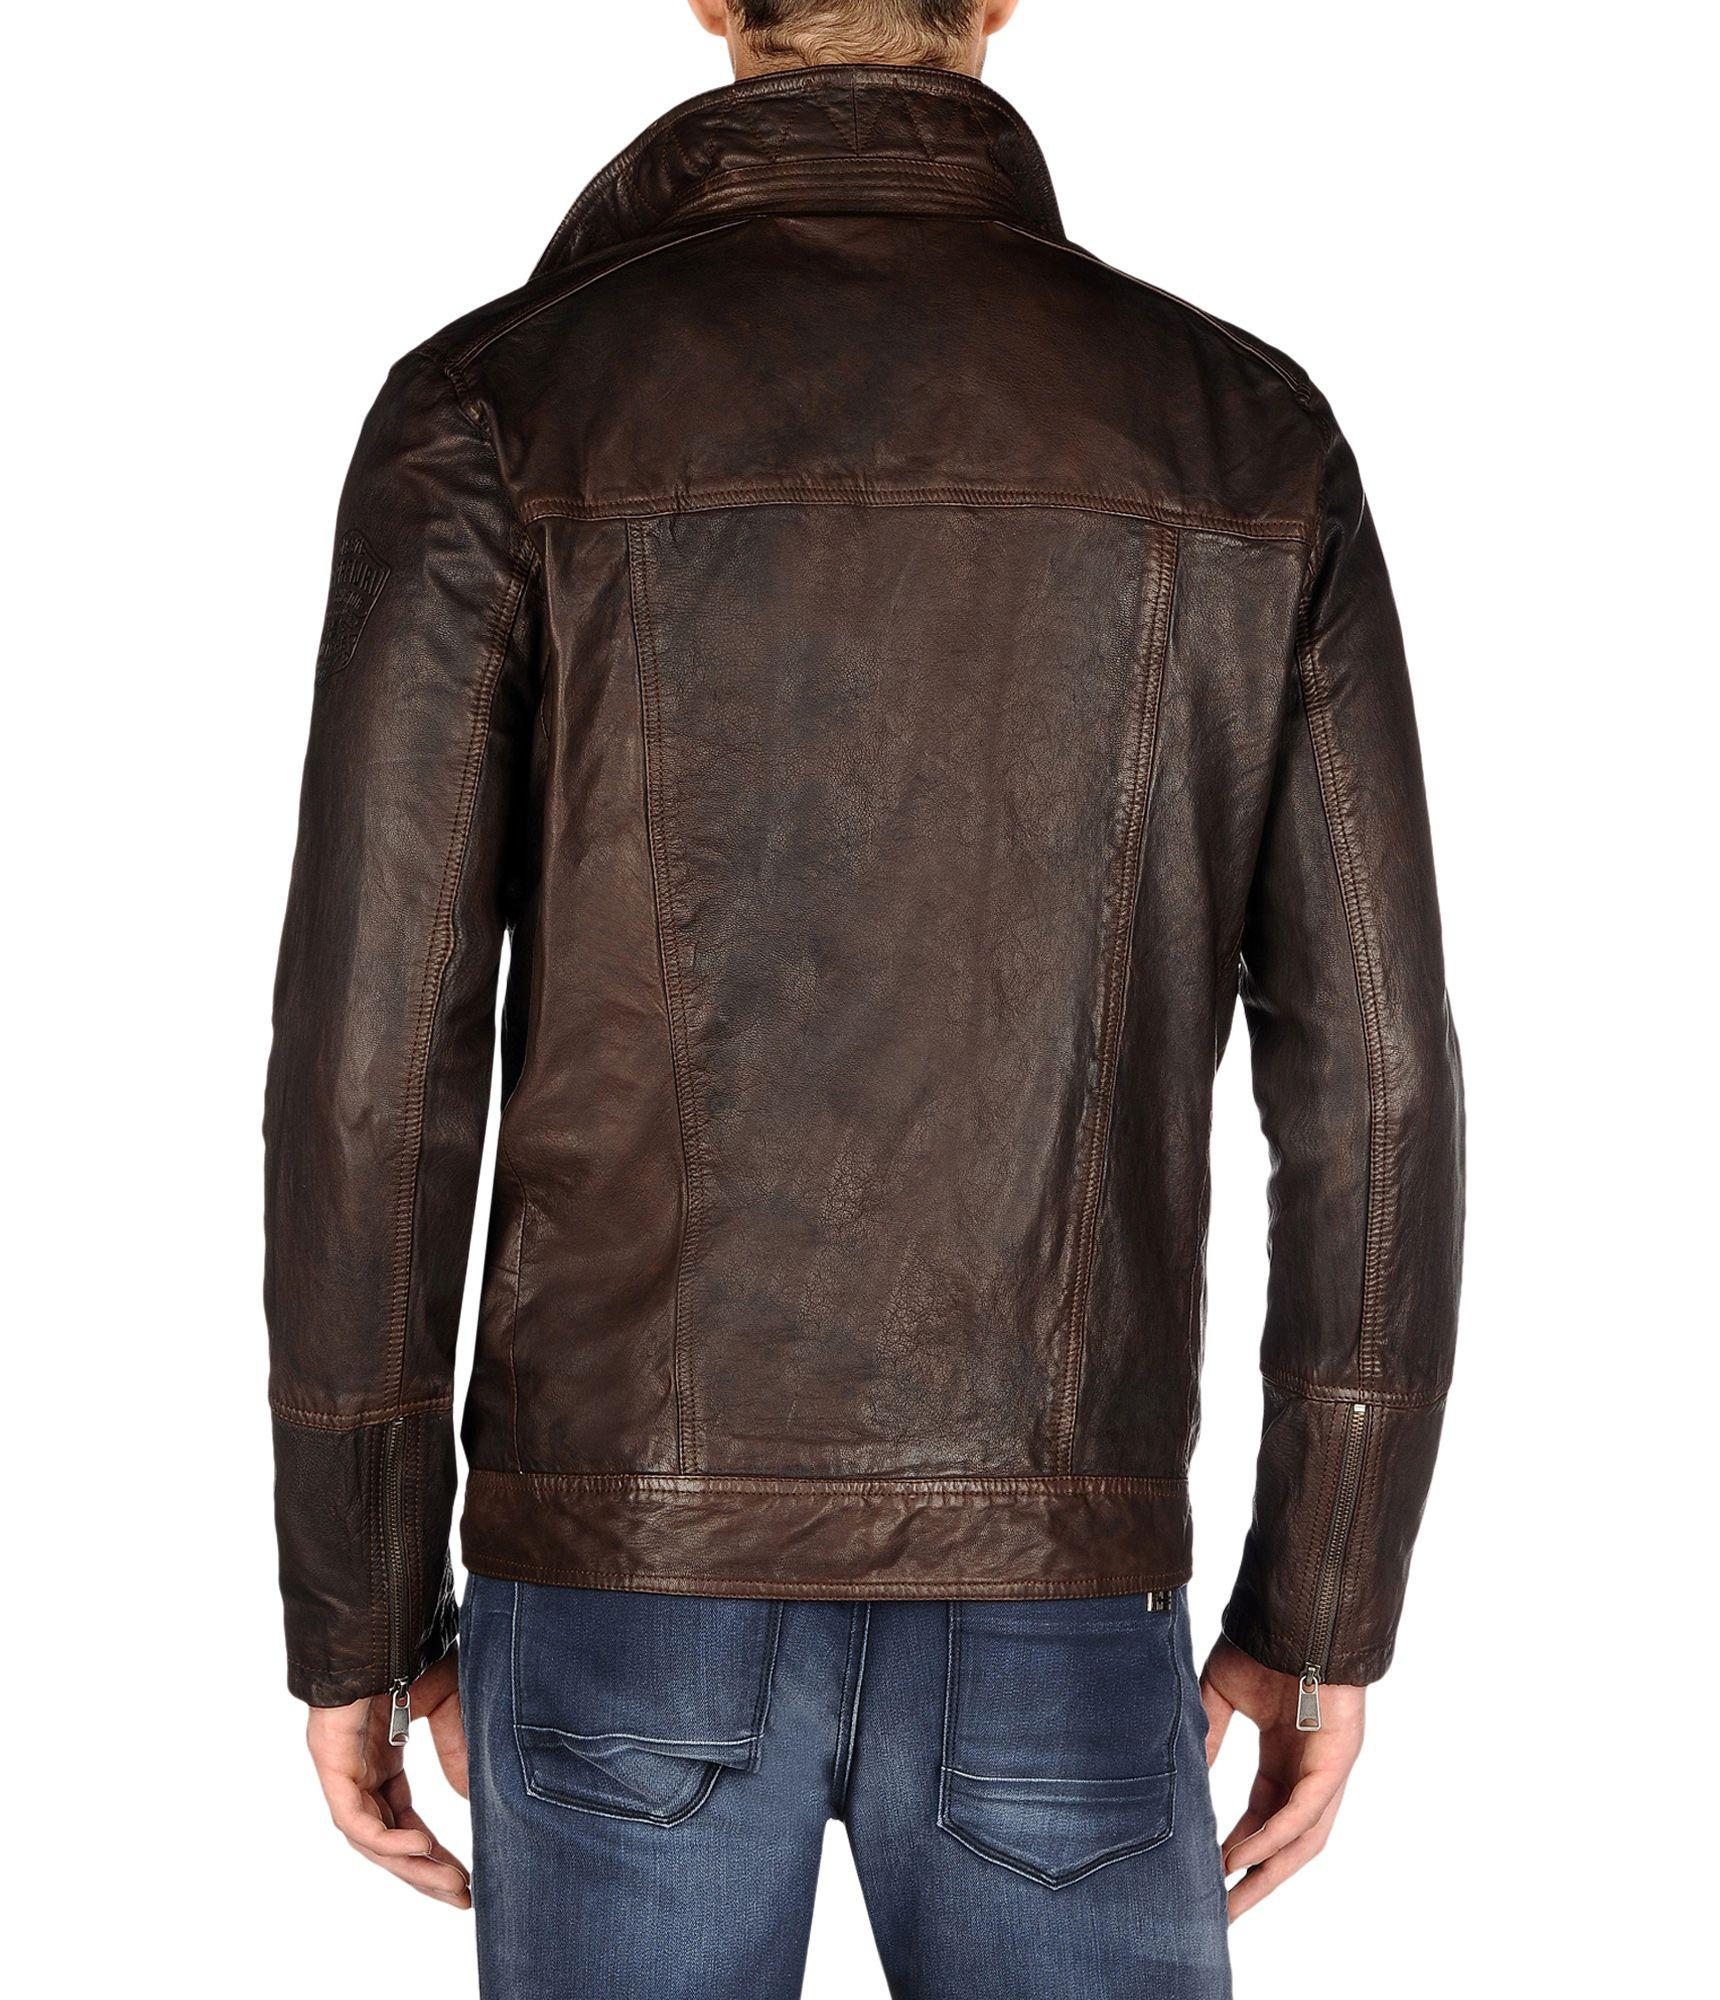 Napapijri leather jacket